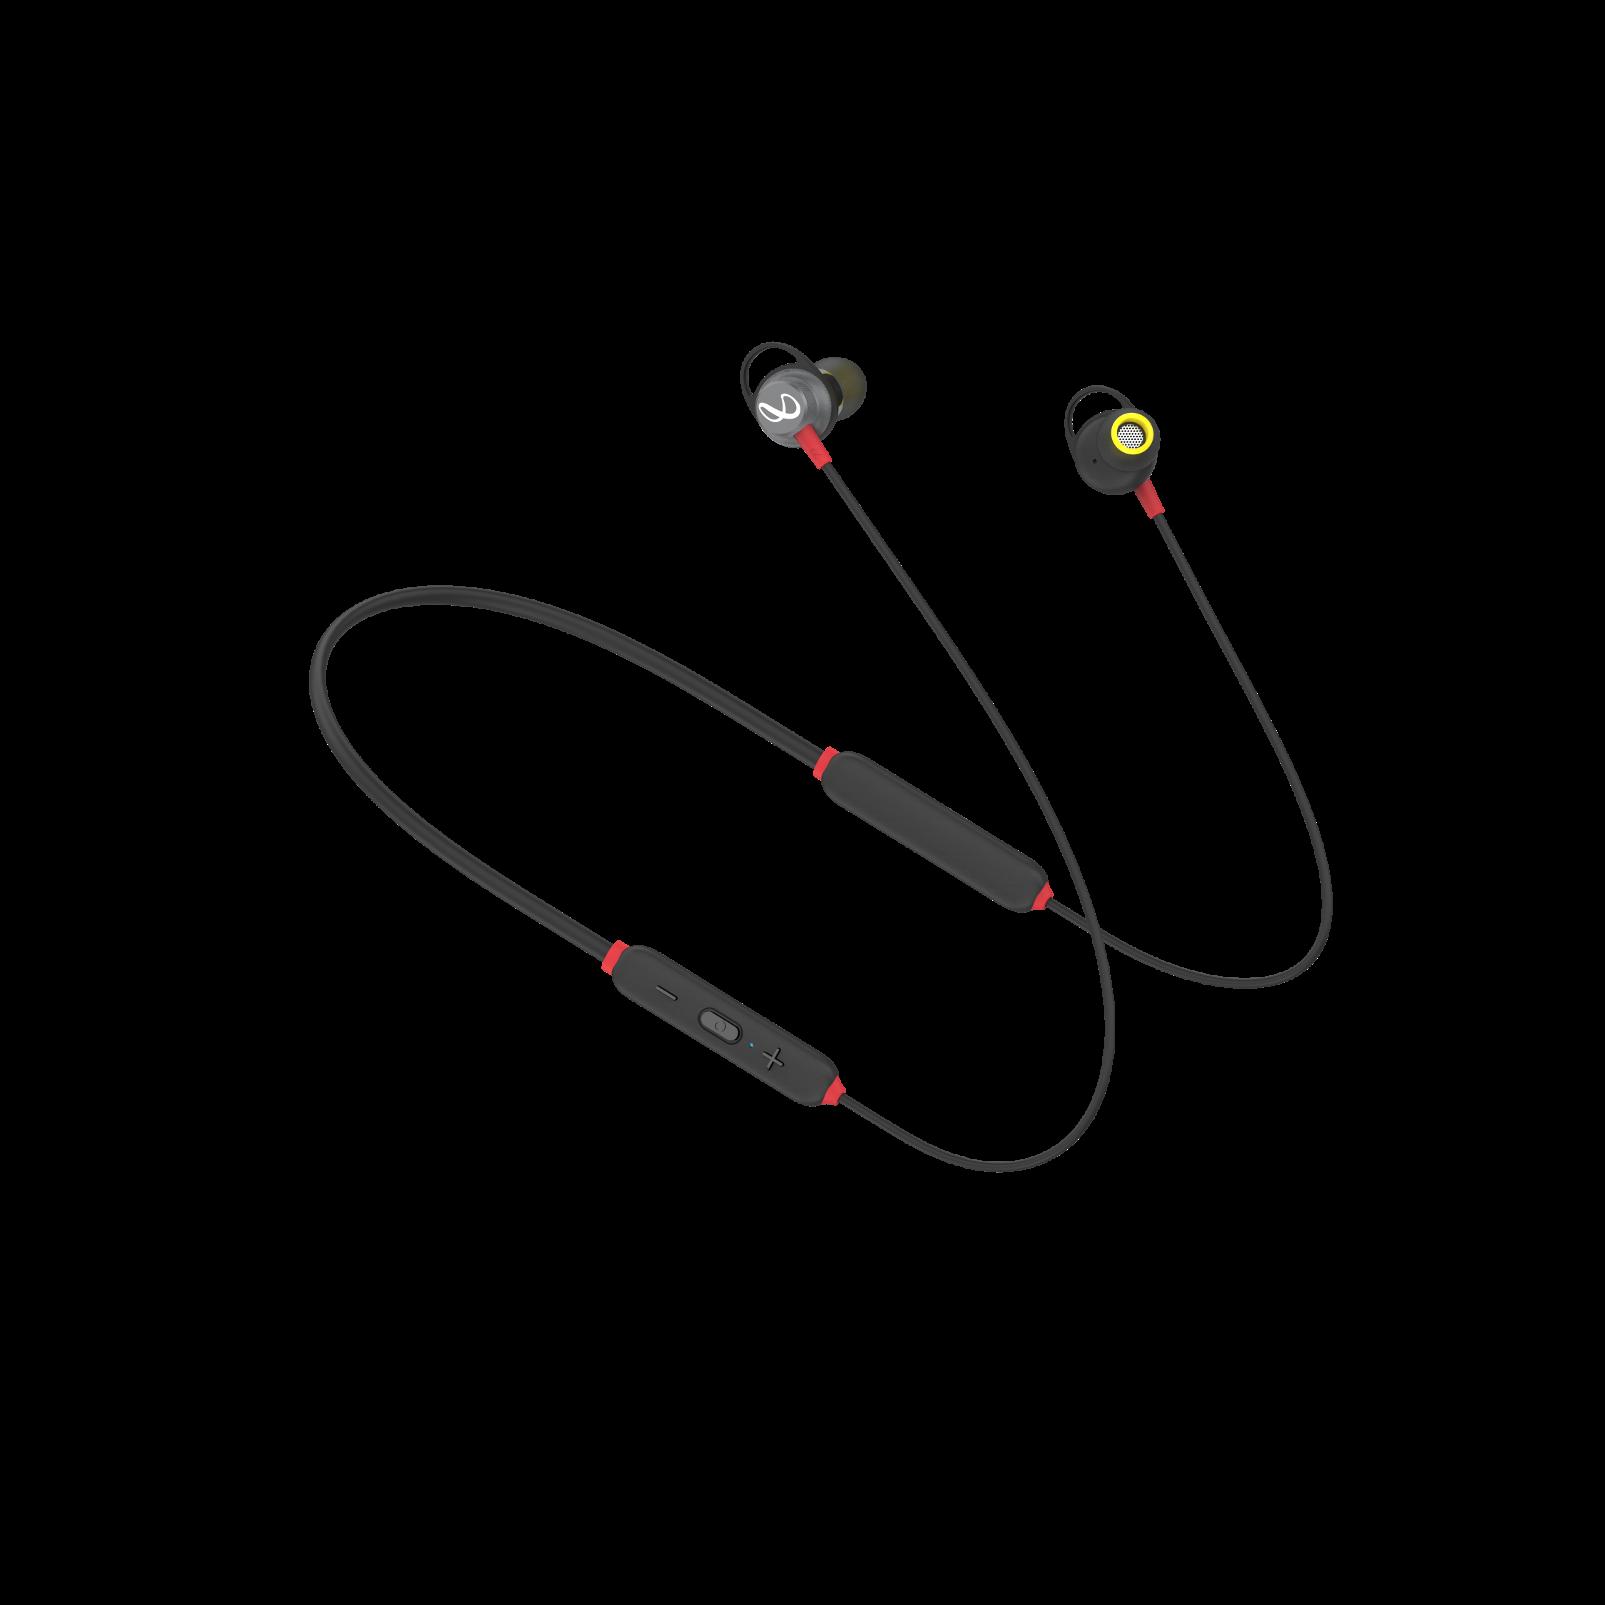 INFINITY GLIDE 120 - Black / Red - Left